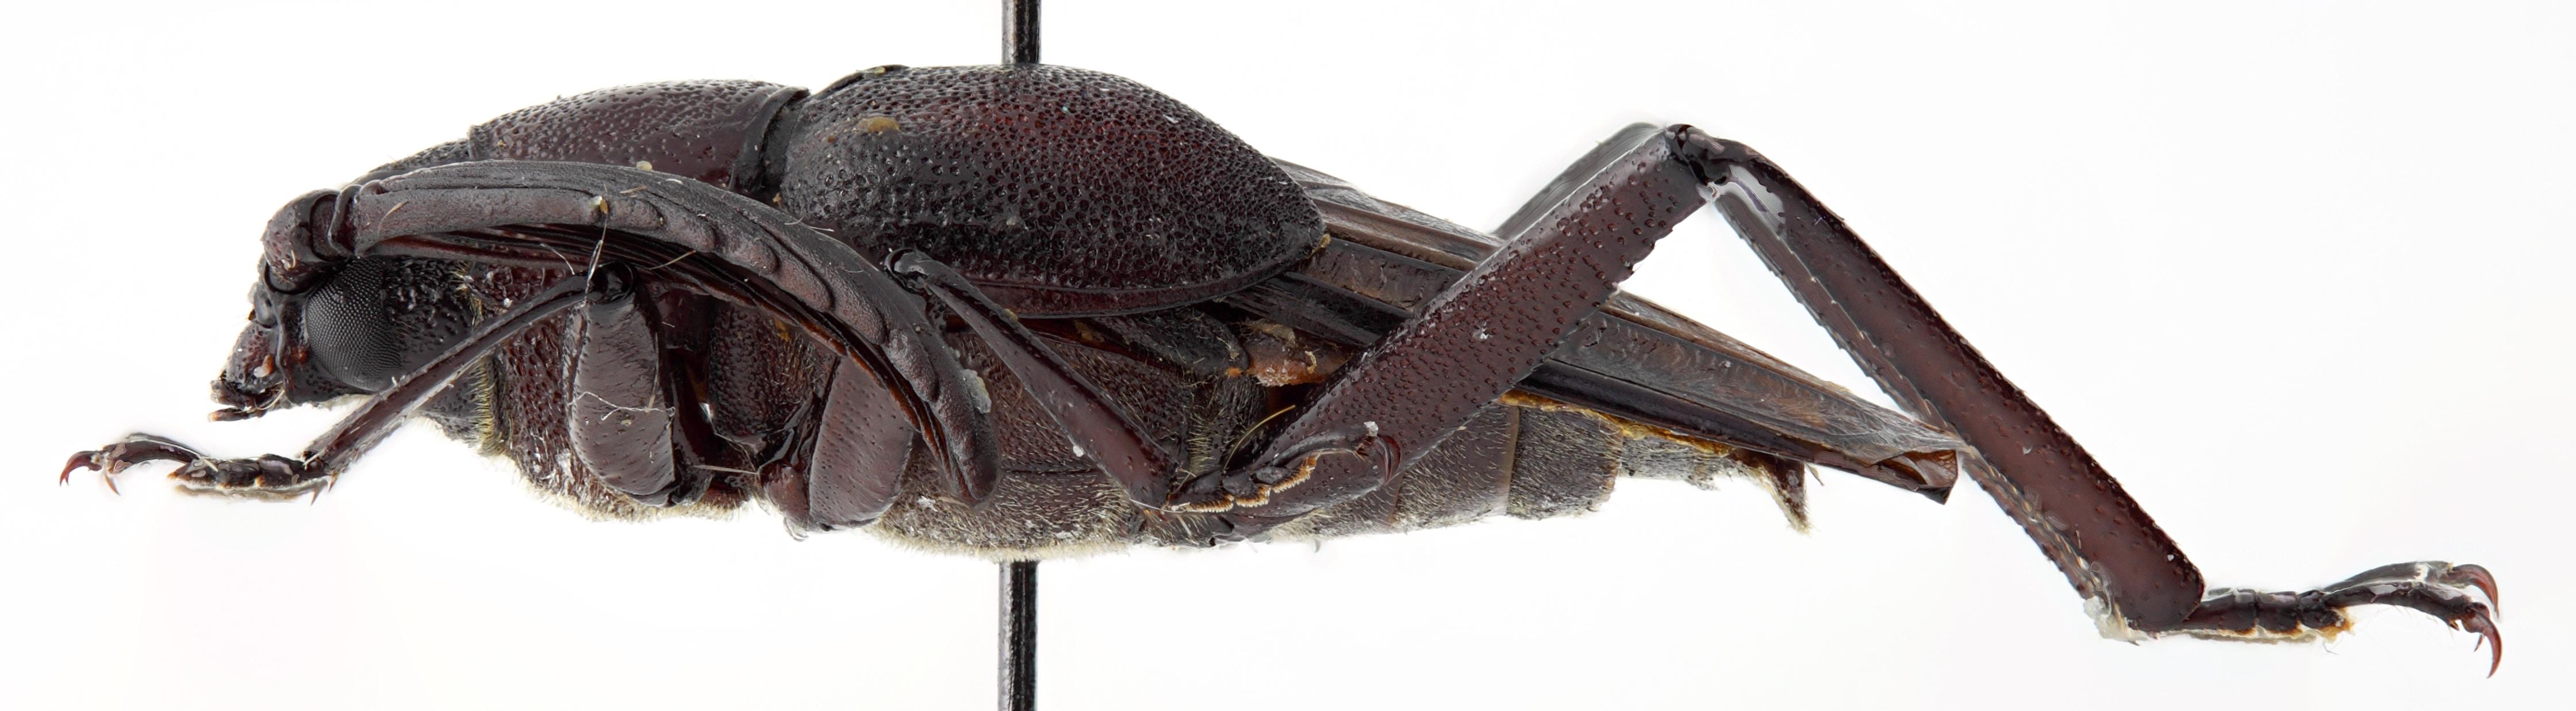 Casiphia vietnamica 02 BL Allotype M 018 BRUS 201405.jpg